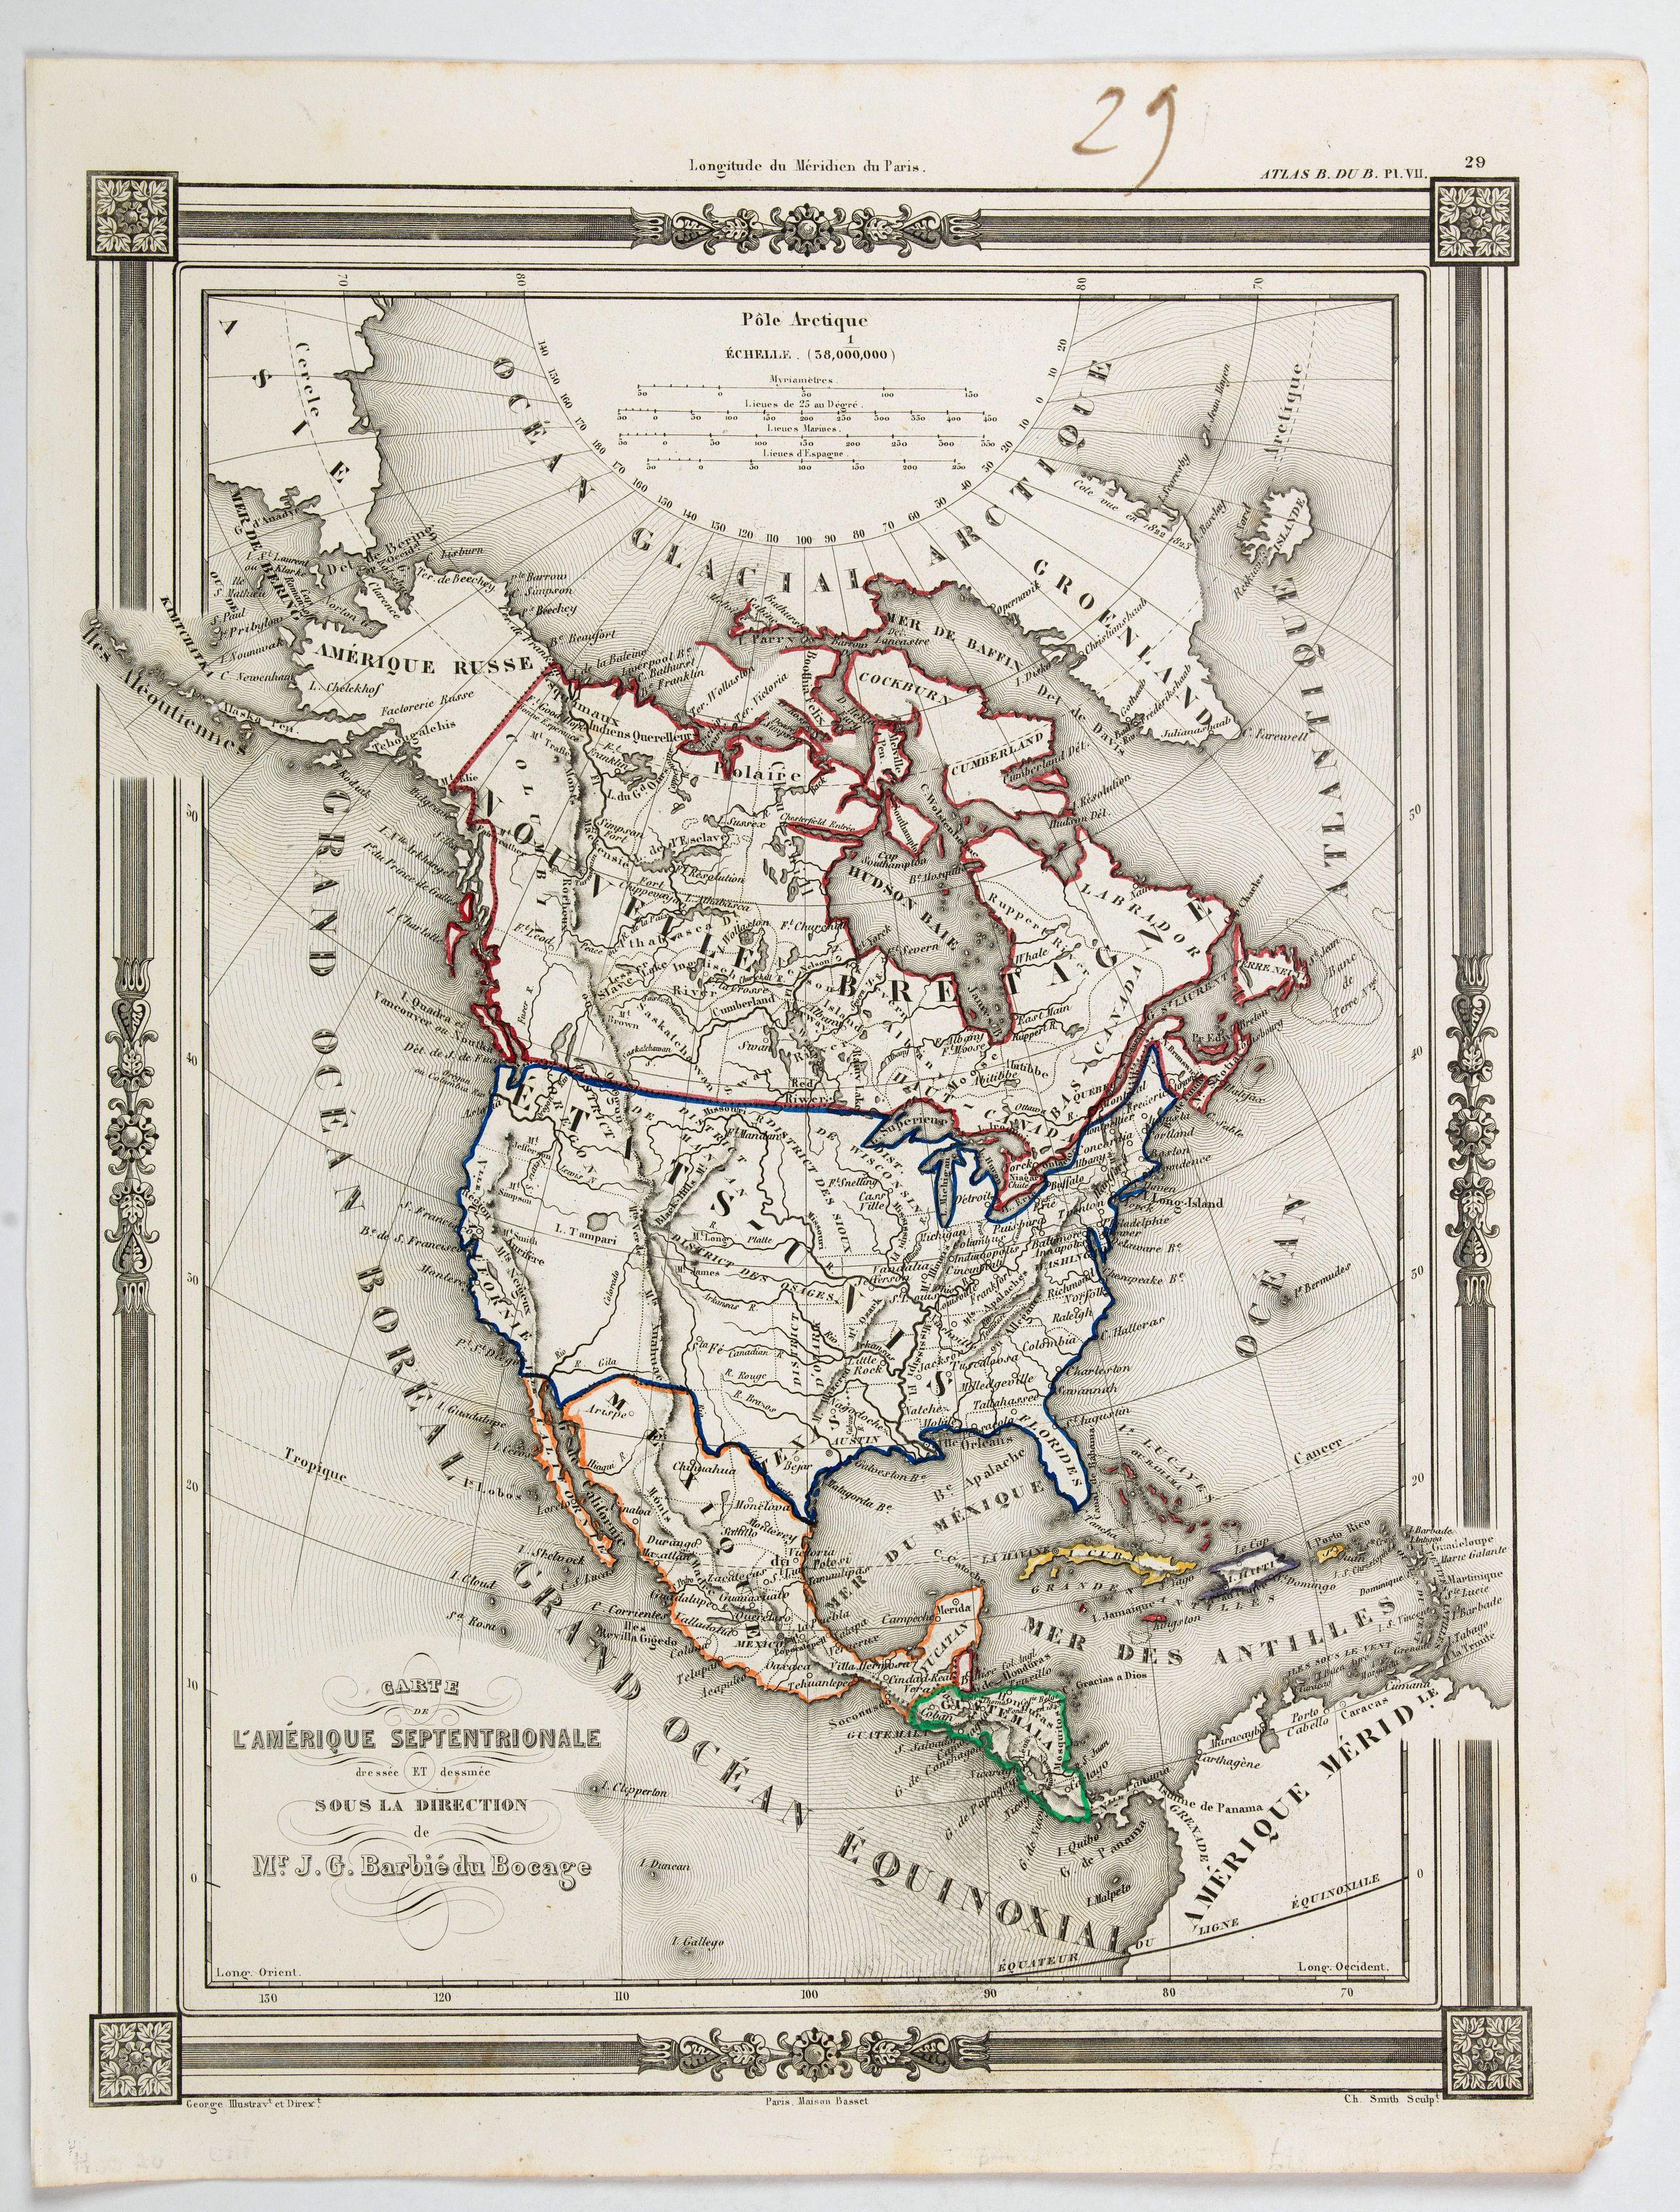 BARBIE du BOCAGE, J.G. - Carte de L'Amerique Septentrionale dresee et dessinee